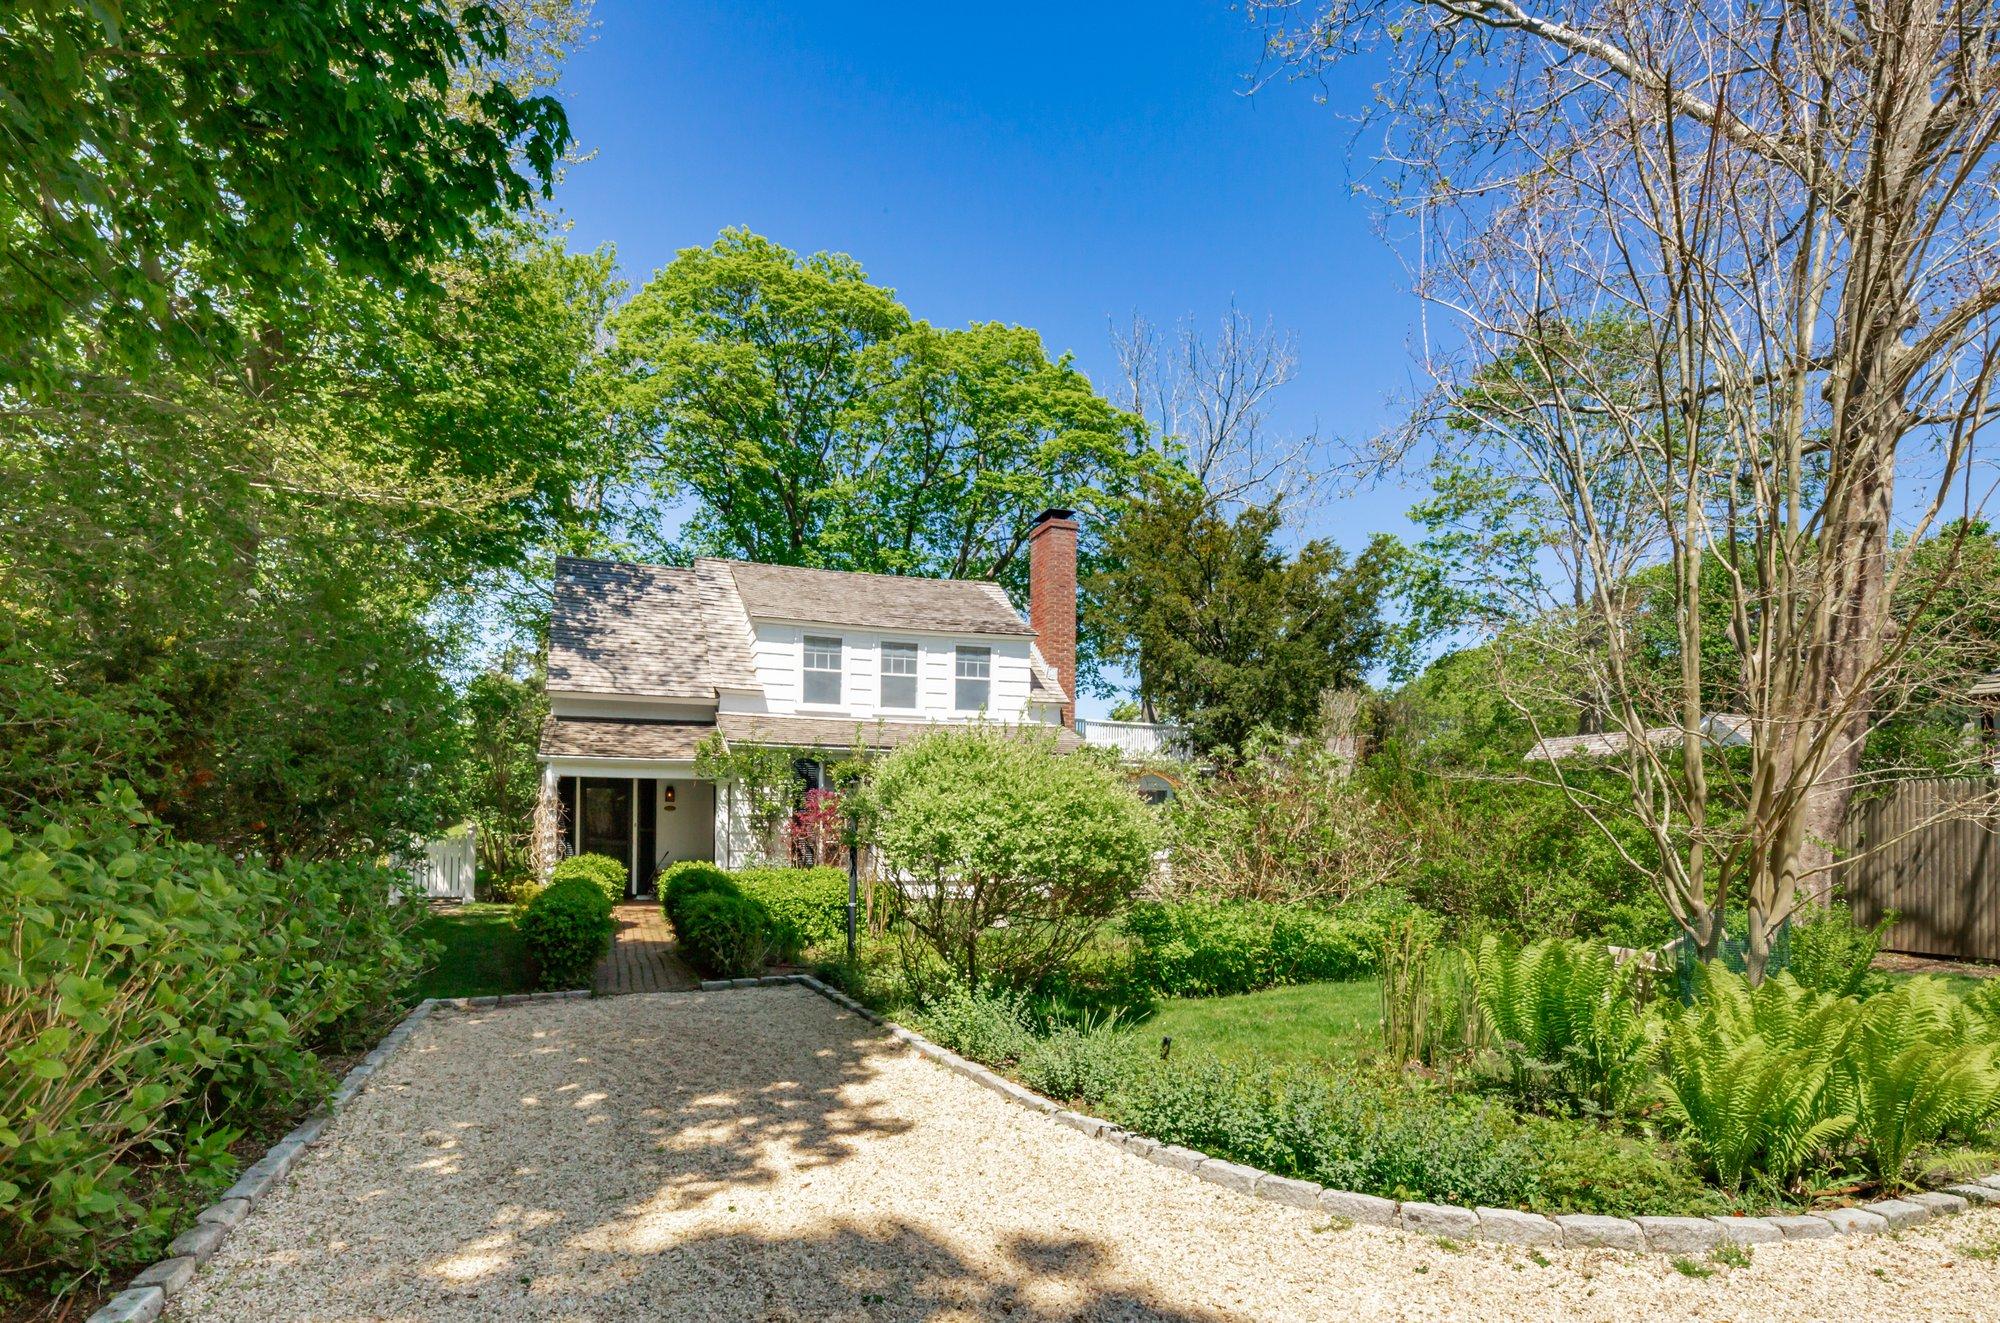 Casa a Southampton, New York, Stati Uniti 1 - 11449560